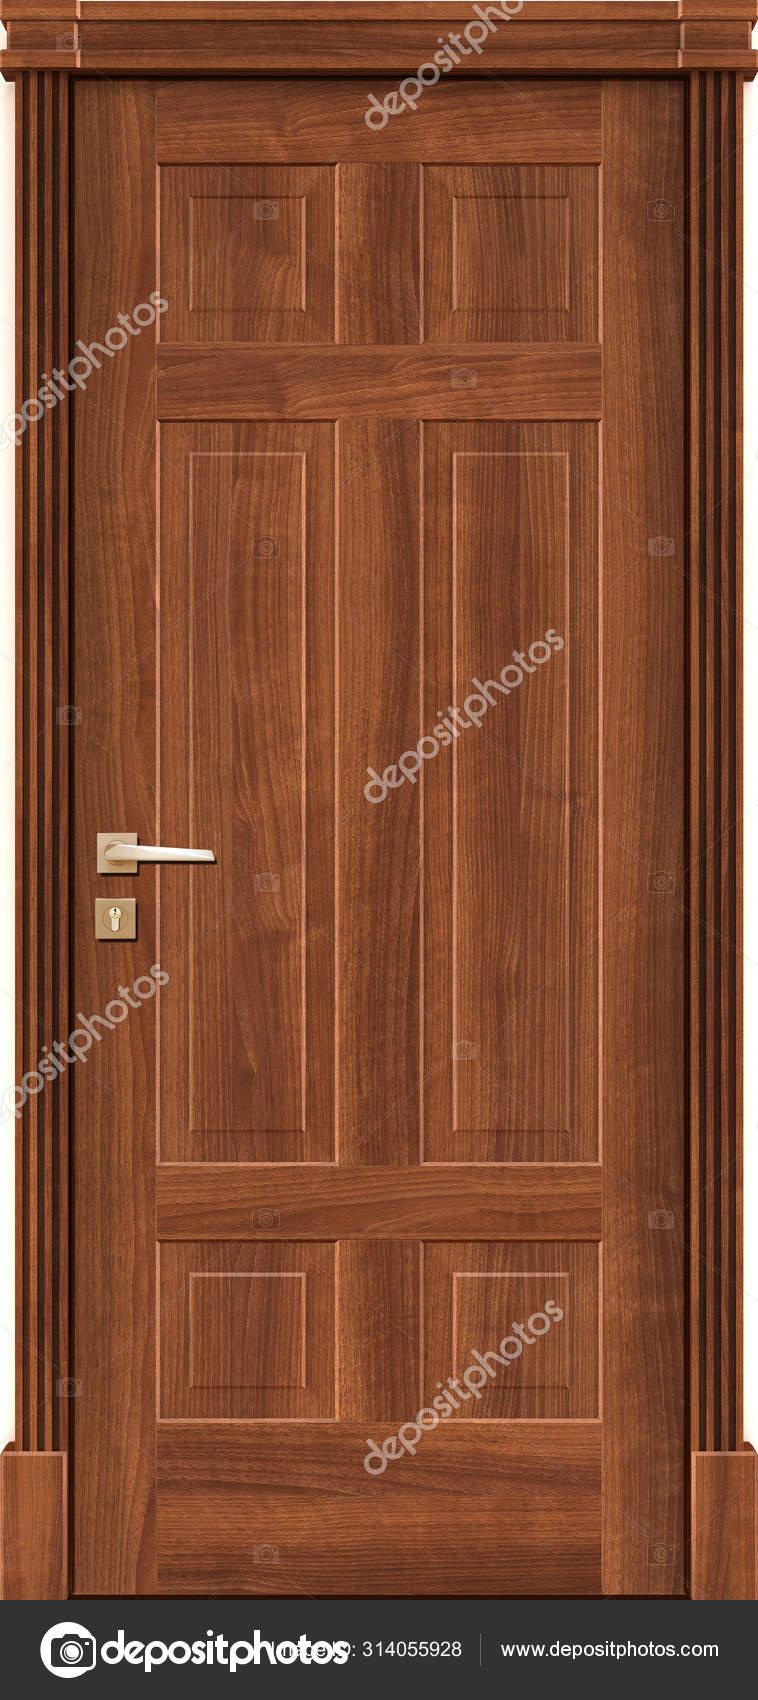 Door Texture Natural Oak Color Classic Interior Render Stock Photo C Aliyevrafail982 Gmail Com 314055928